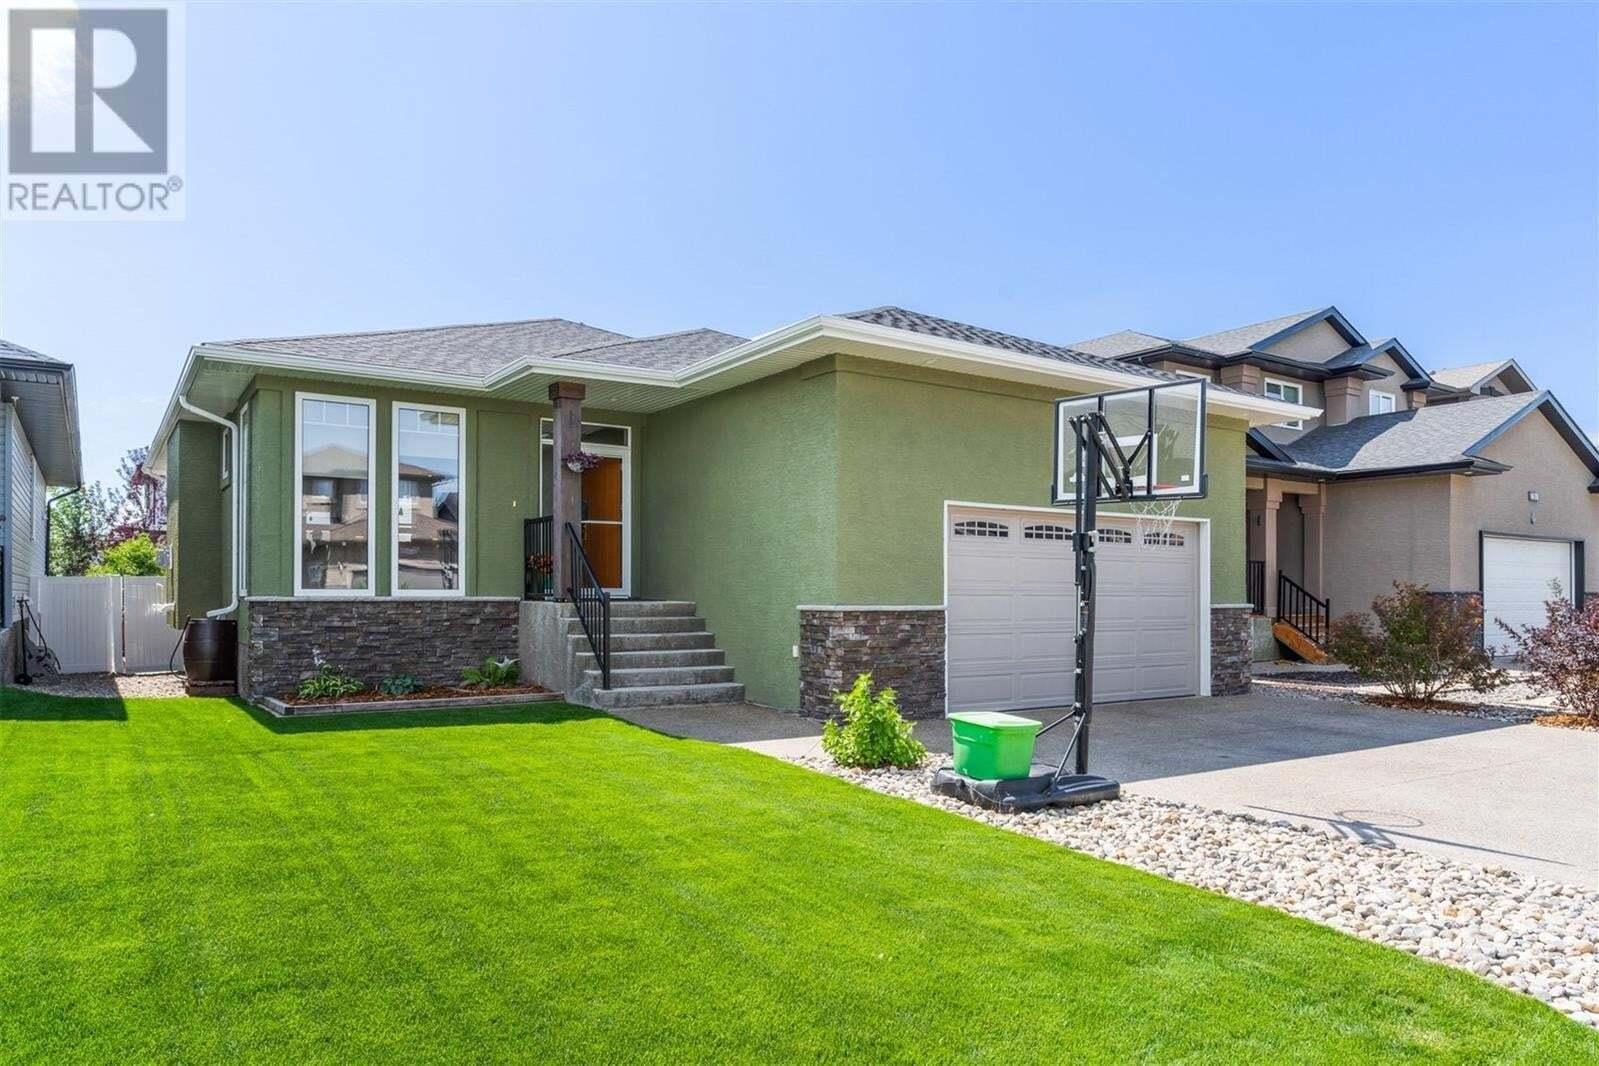 House for sale at 4634 Curtiss Ave Regina Saskatchewan - MLS: SK821222